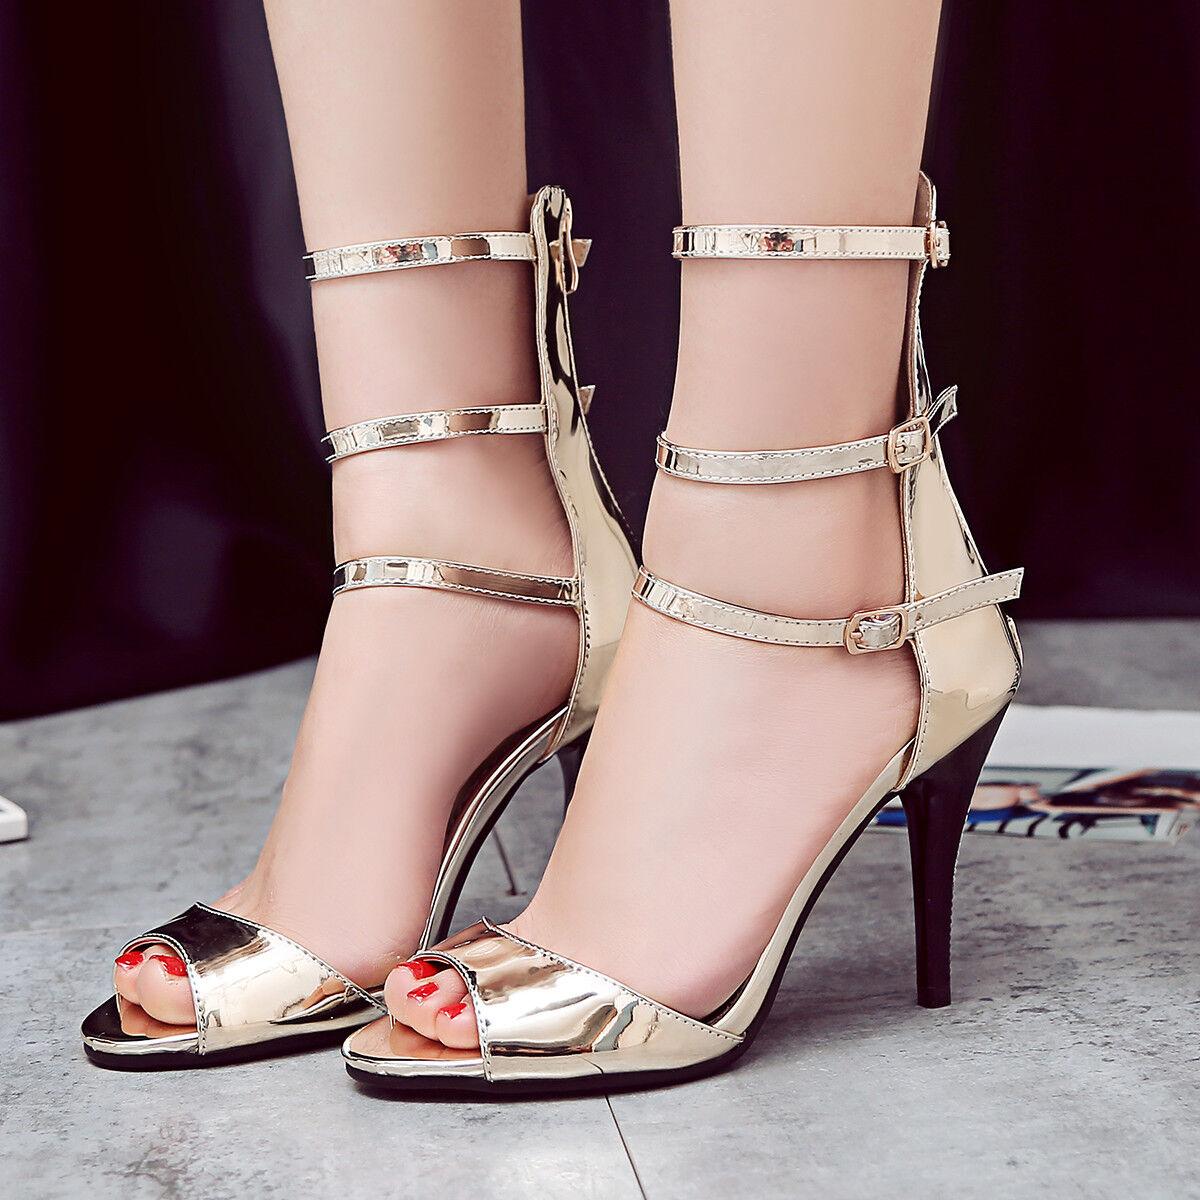 Women High Gladiator Roman Sandals Plus Size Strappy High Women Heels Stilettos Pumps shoes 7529c6